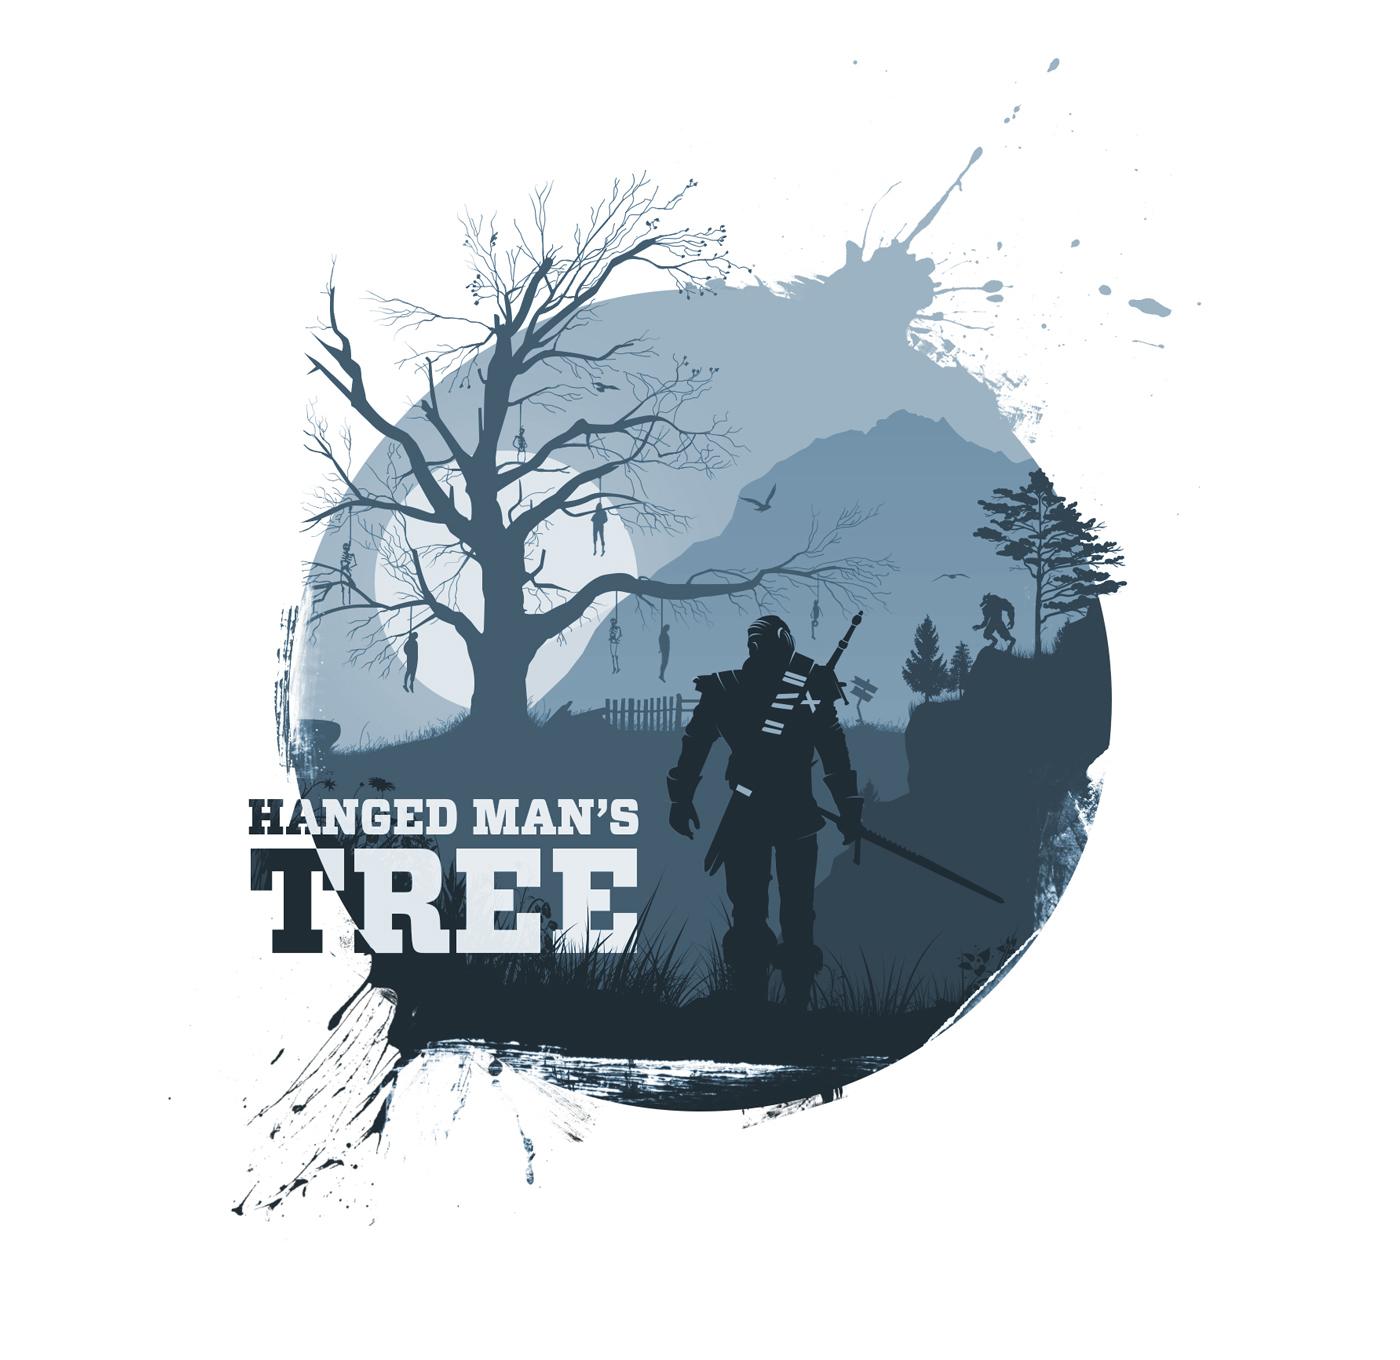 geralt witcher3 wild Hunt tshirt Gaming game ciri rpg